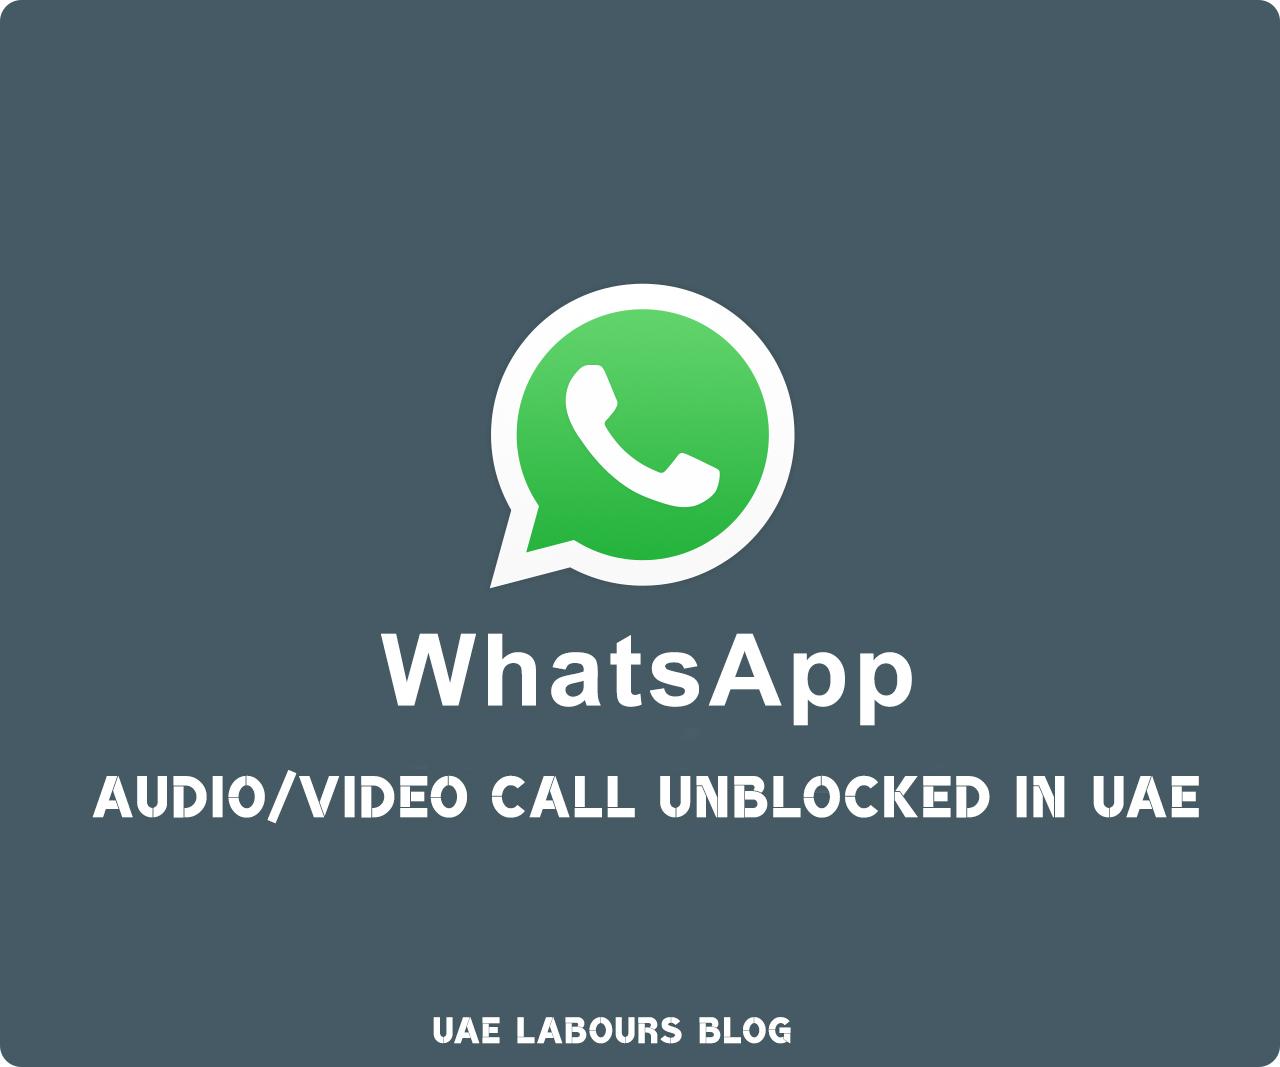 Whatsapp Calls enabled in UAE - UAE LABOURS